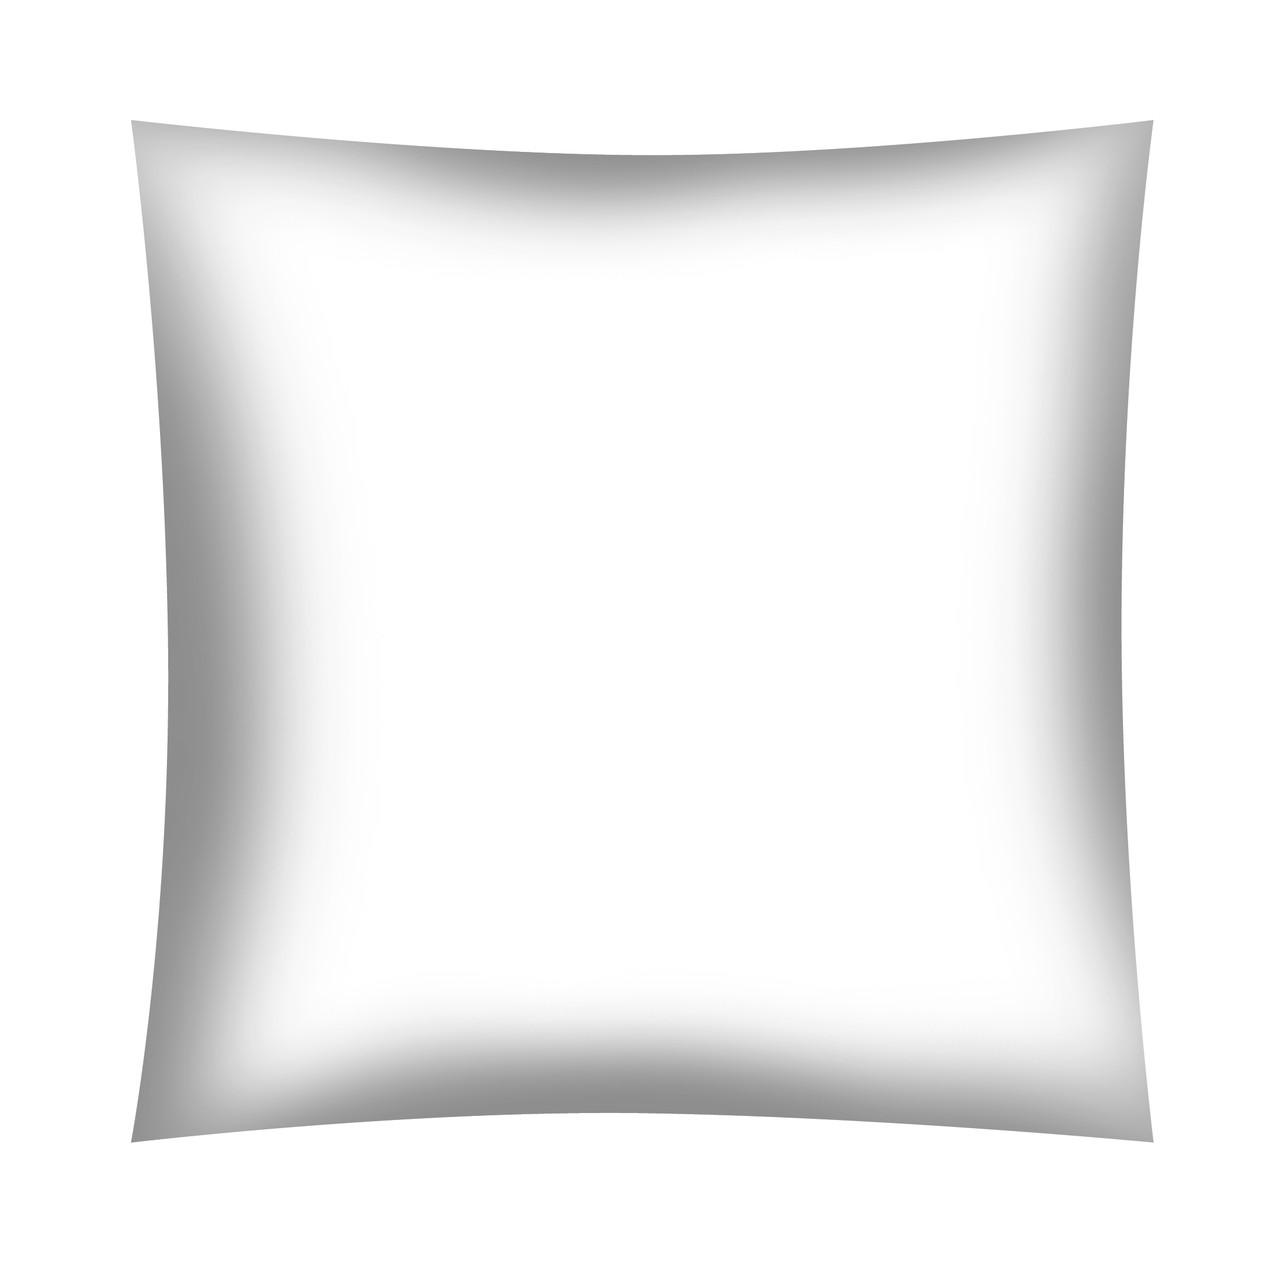 ✁ Отрезы ткани Отбеленная бязь 140 г/м2